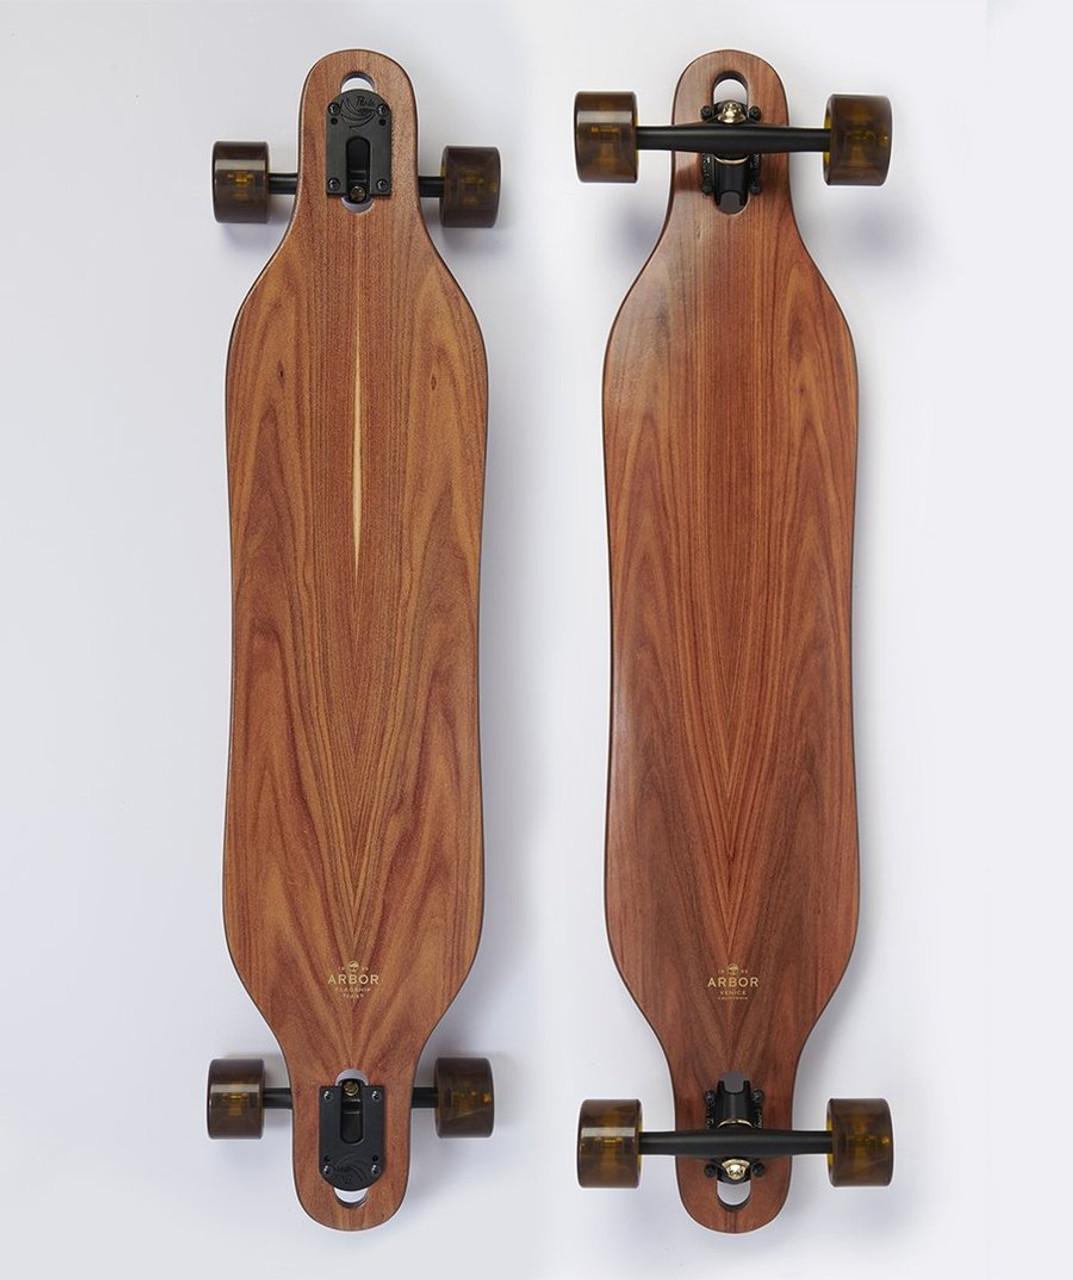 Catalyst Flagship Arbor Skateboard